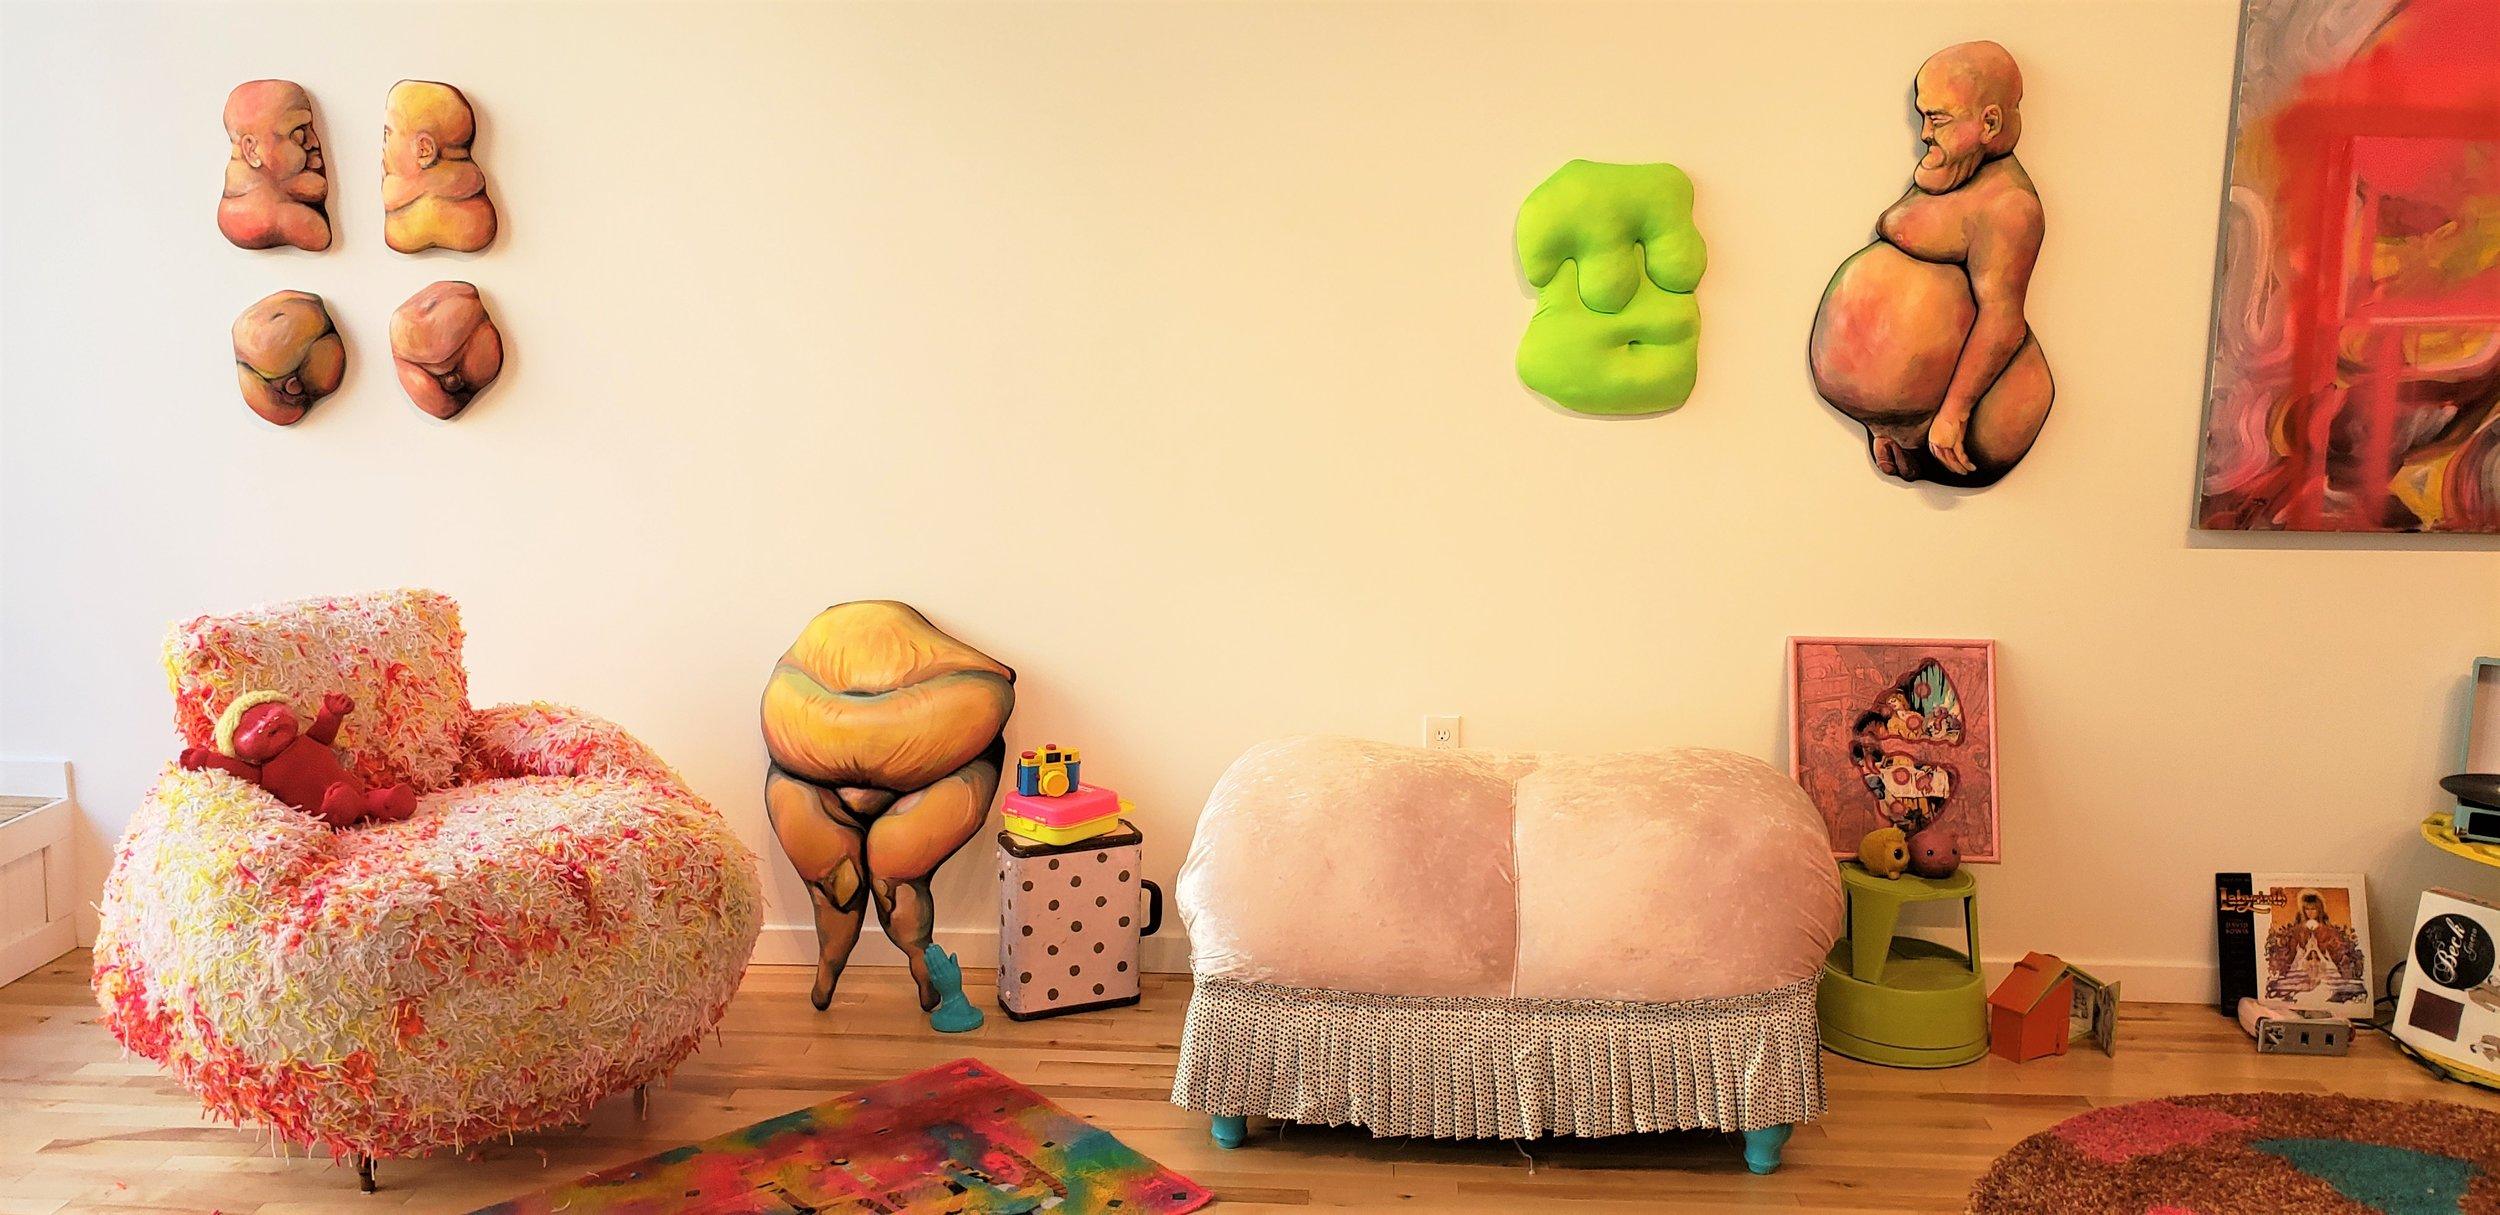 Living Room Items4.jpg